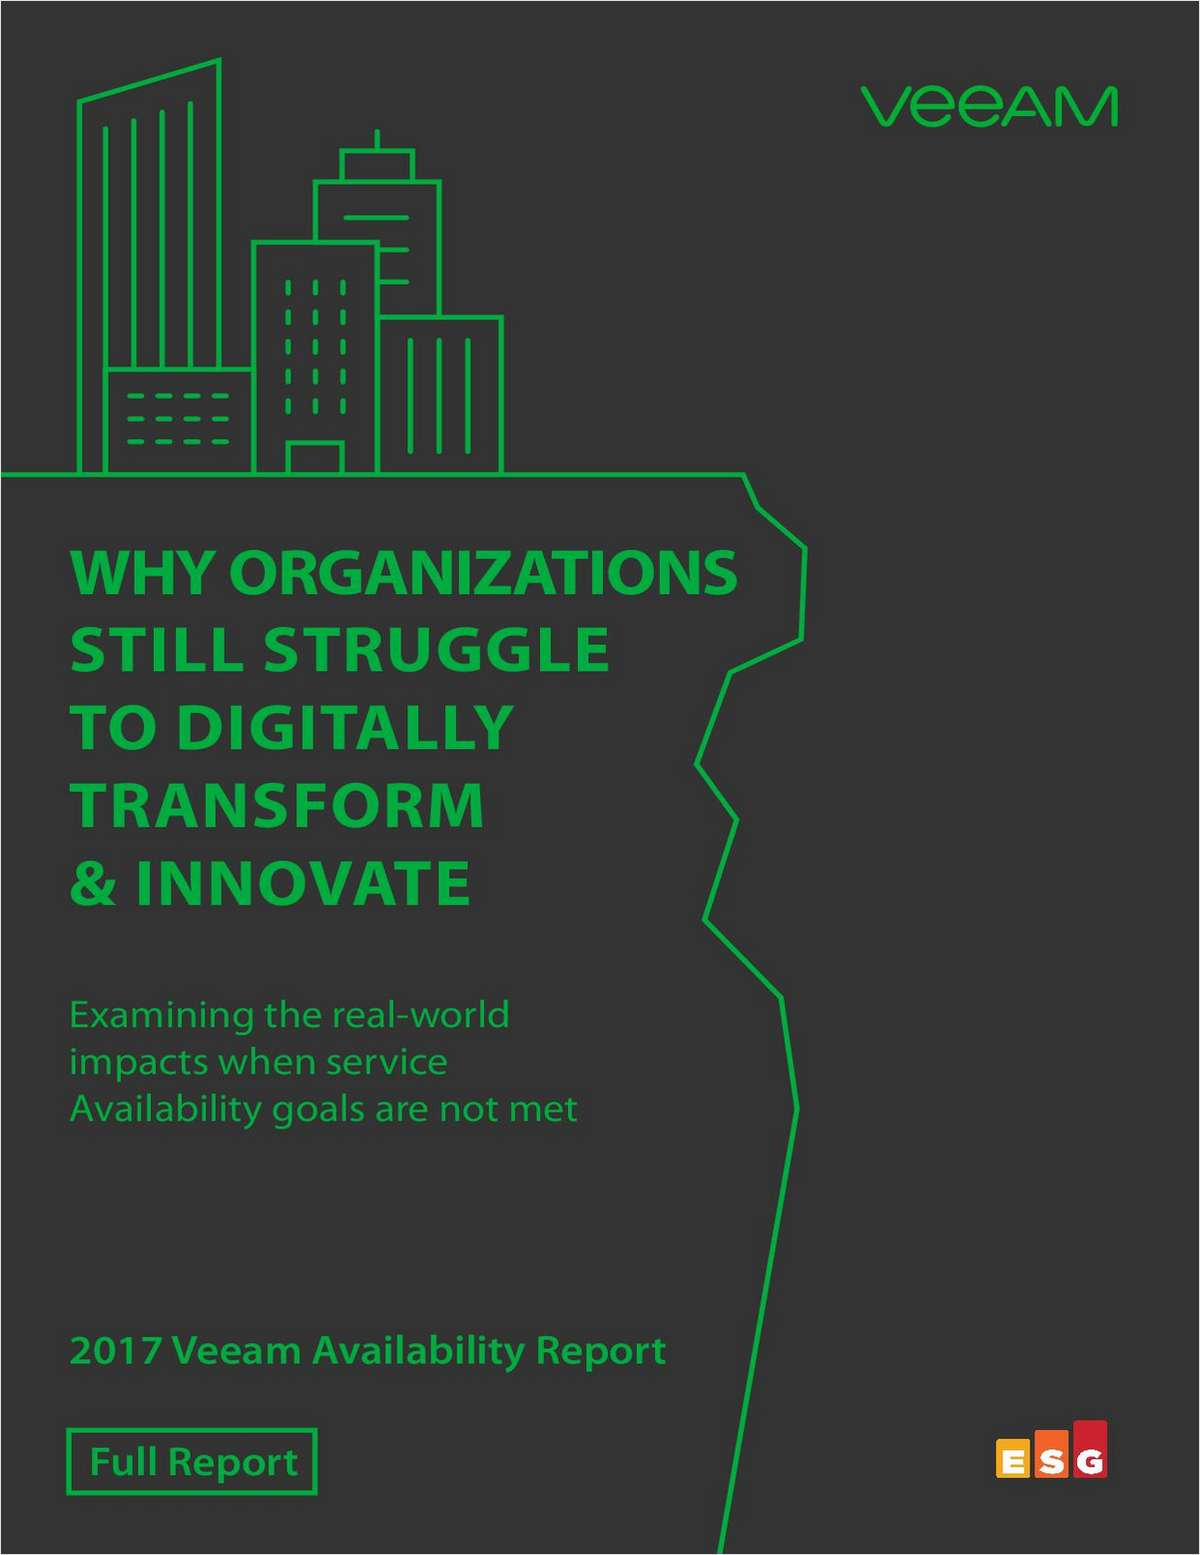 Why Organizations Still Struggle to Digitally Transform & Innovate